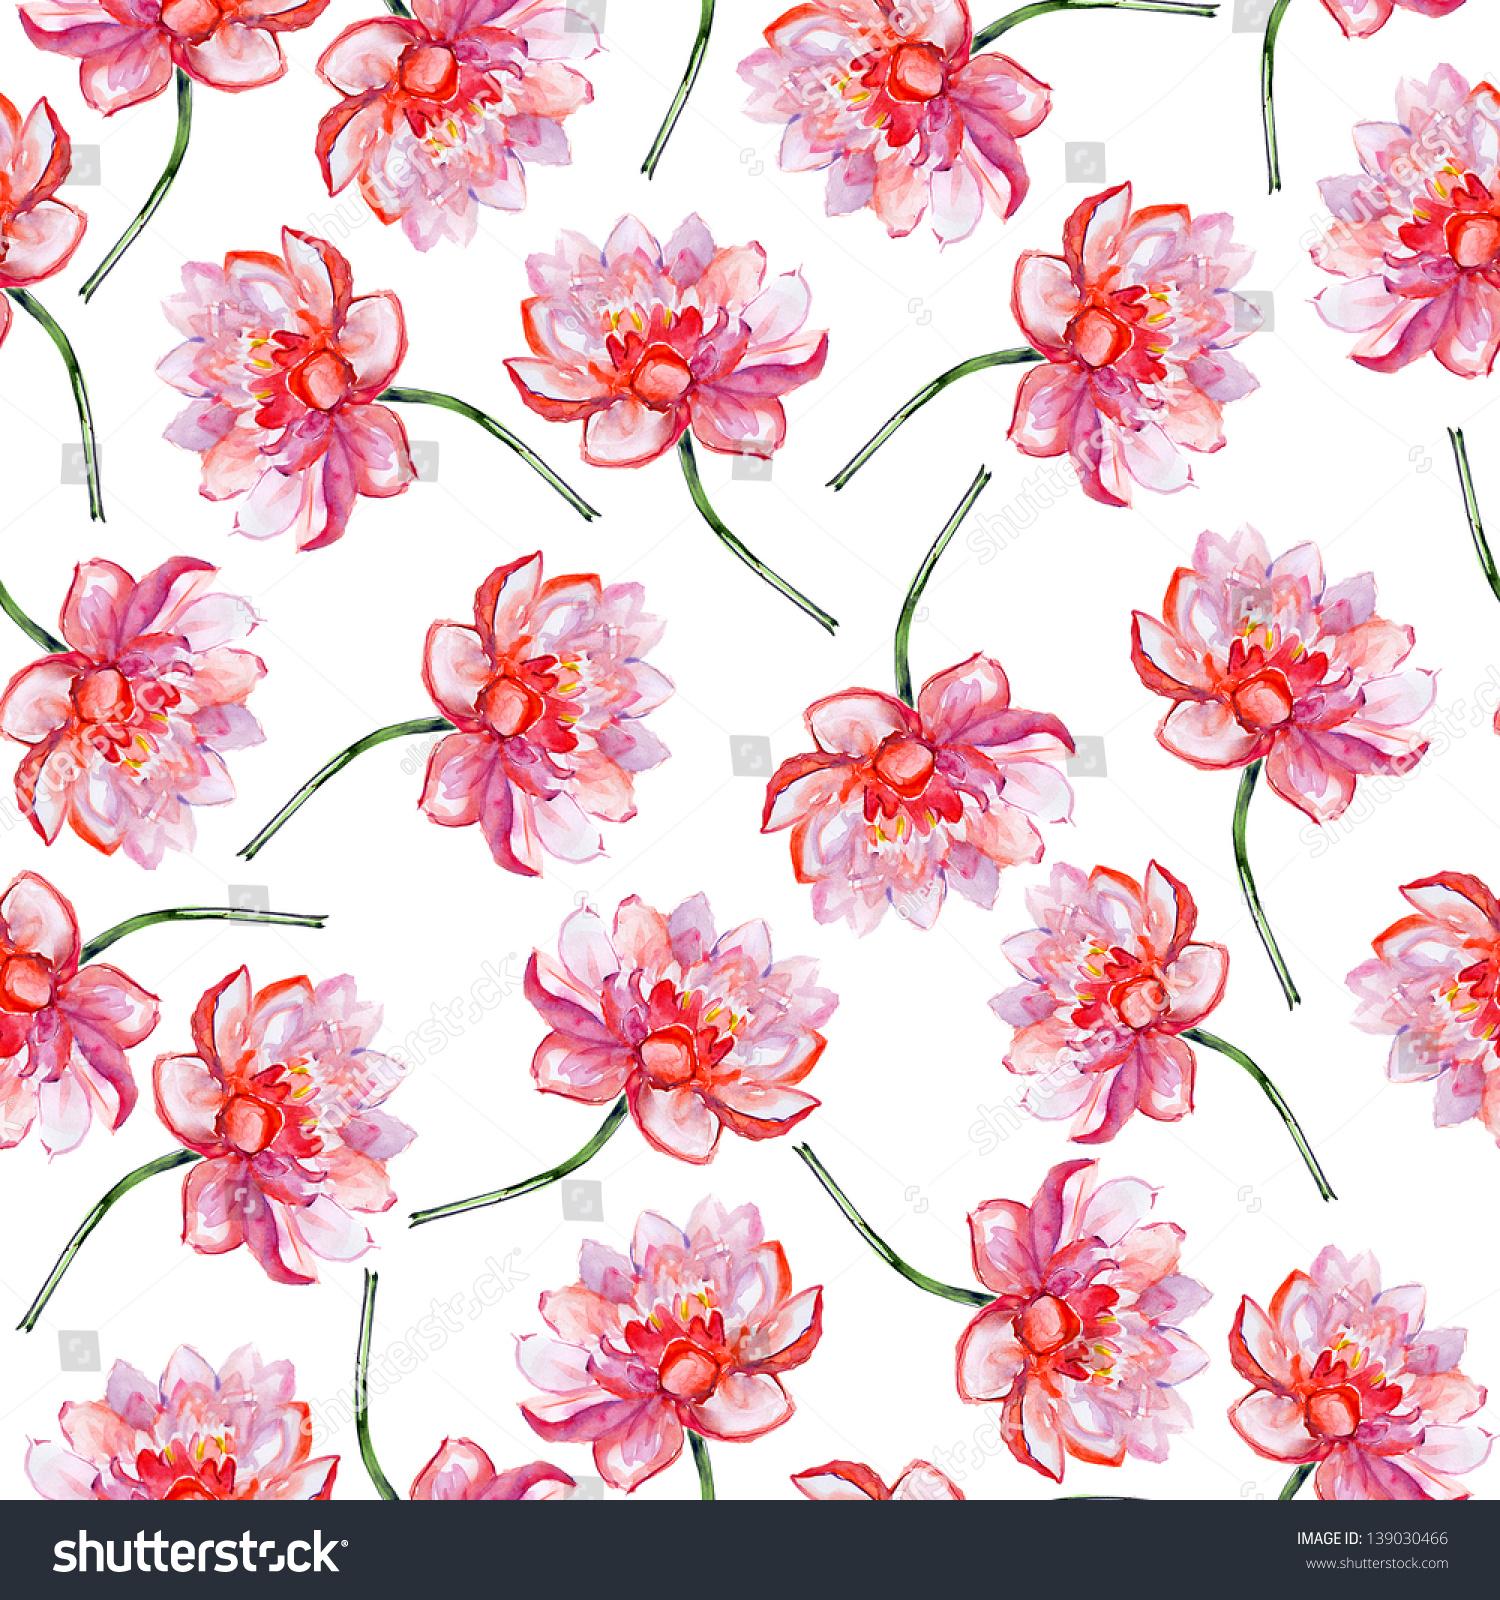 Lotus flower pattern watercolor stock illustration 139030466 lotus flower pattern watercolor izmirmasajfo